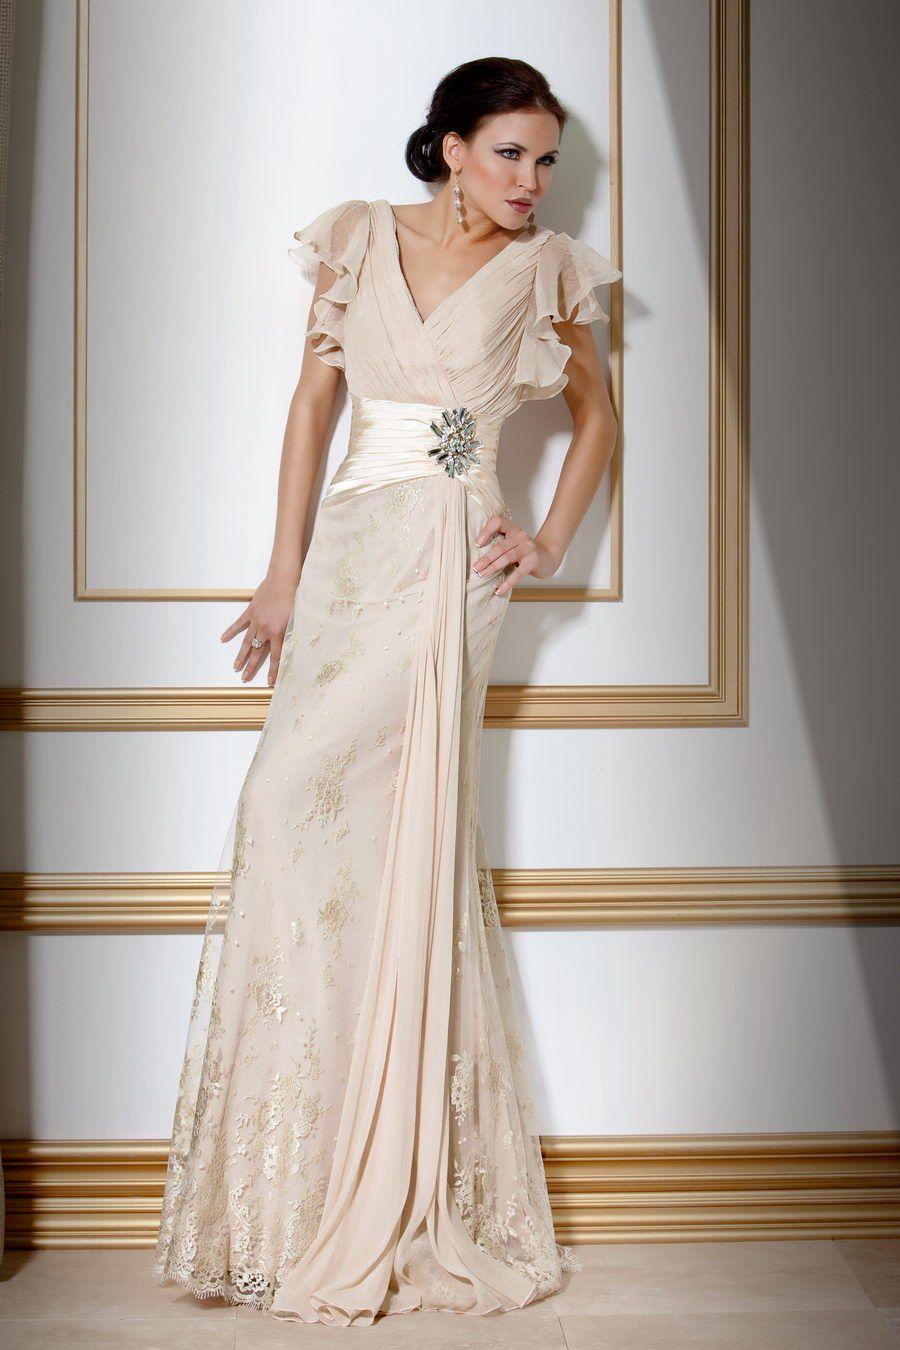 Silk sheath wedding dress  Chiffon Jovani designer gown  Clothes and Shoes  Pinterest